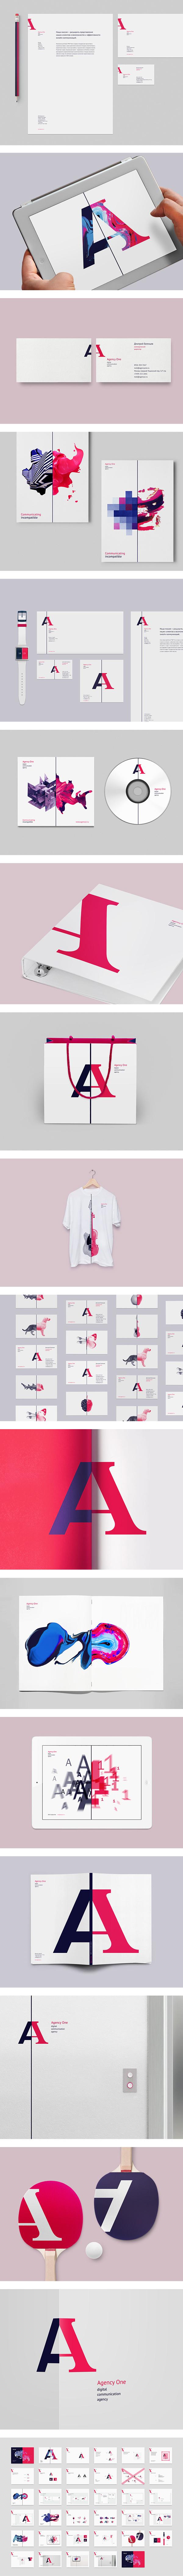 Agency One #logo #identity #excellente